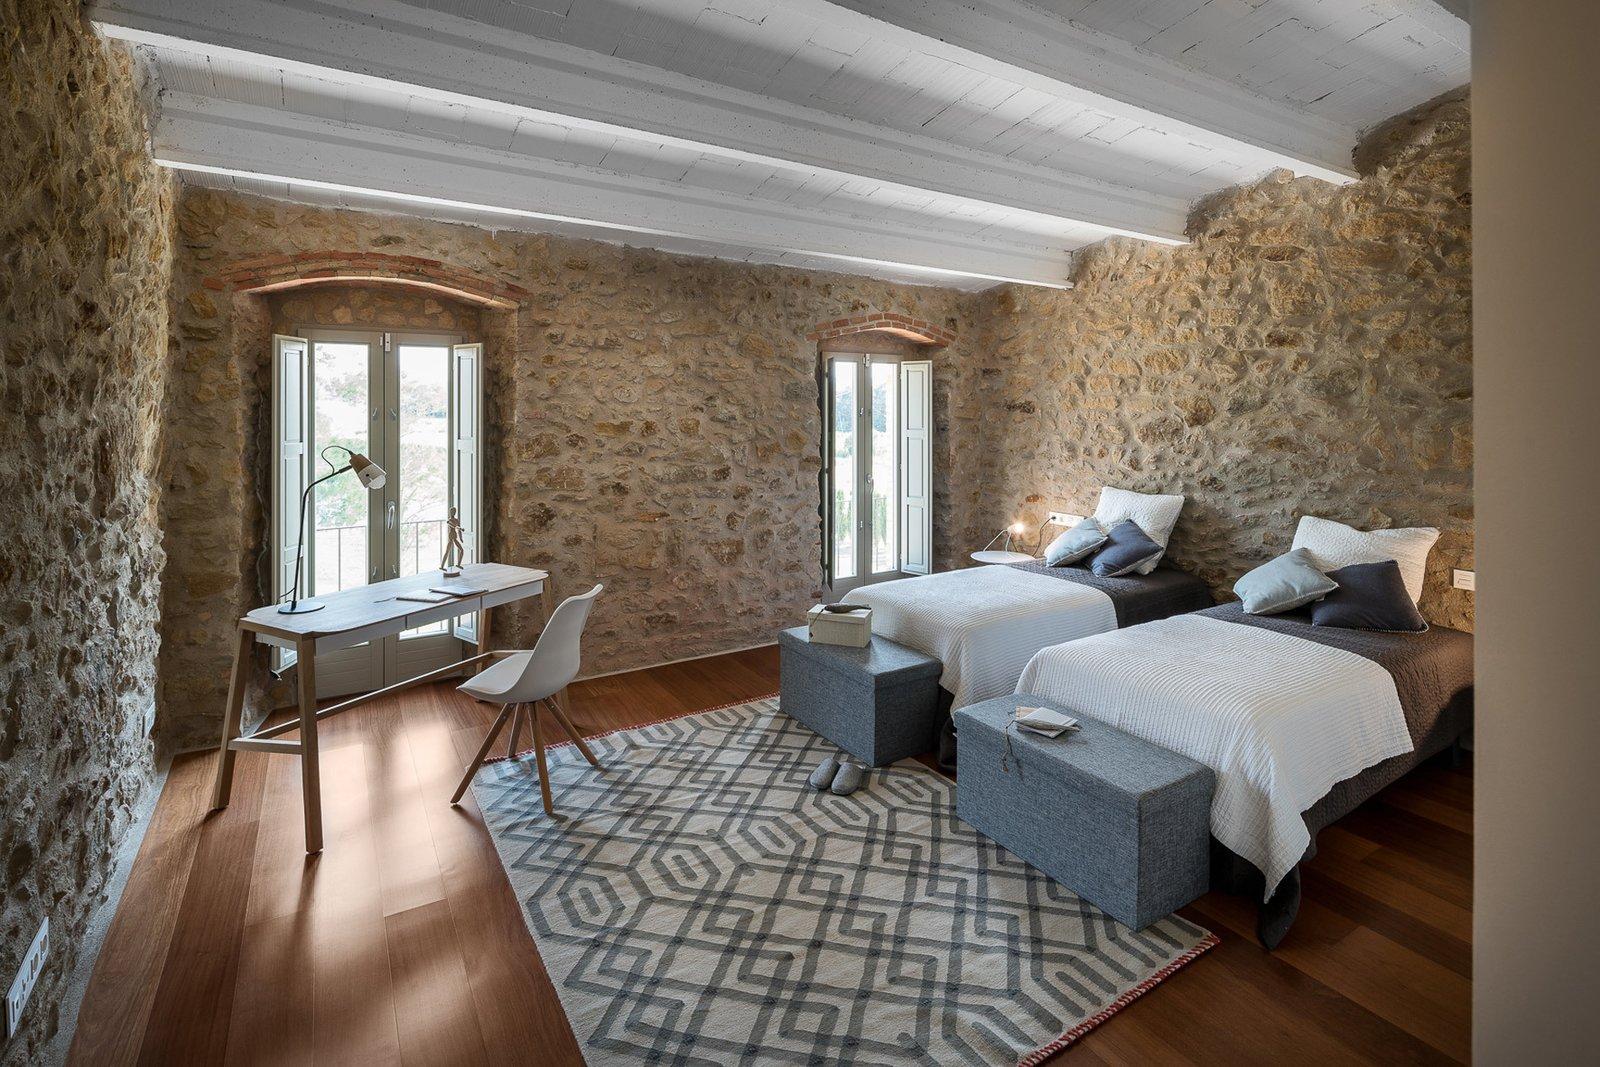 Photo 12 of 14 in Farmhouse In Girona, Spain